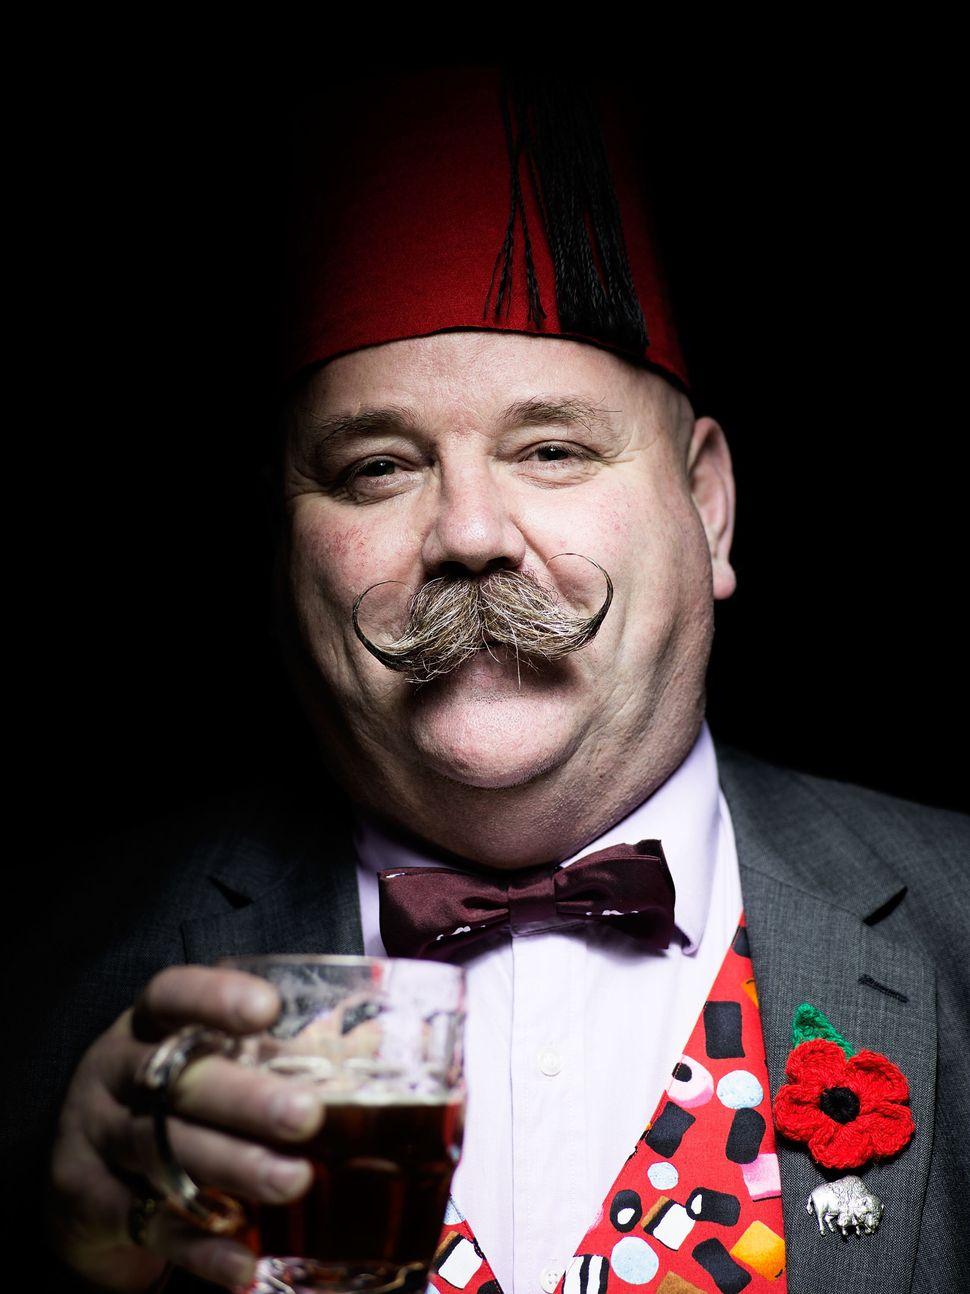 Handlebar Club member Mark East, sporting a classic handlebar moustache.